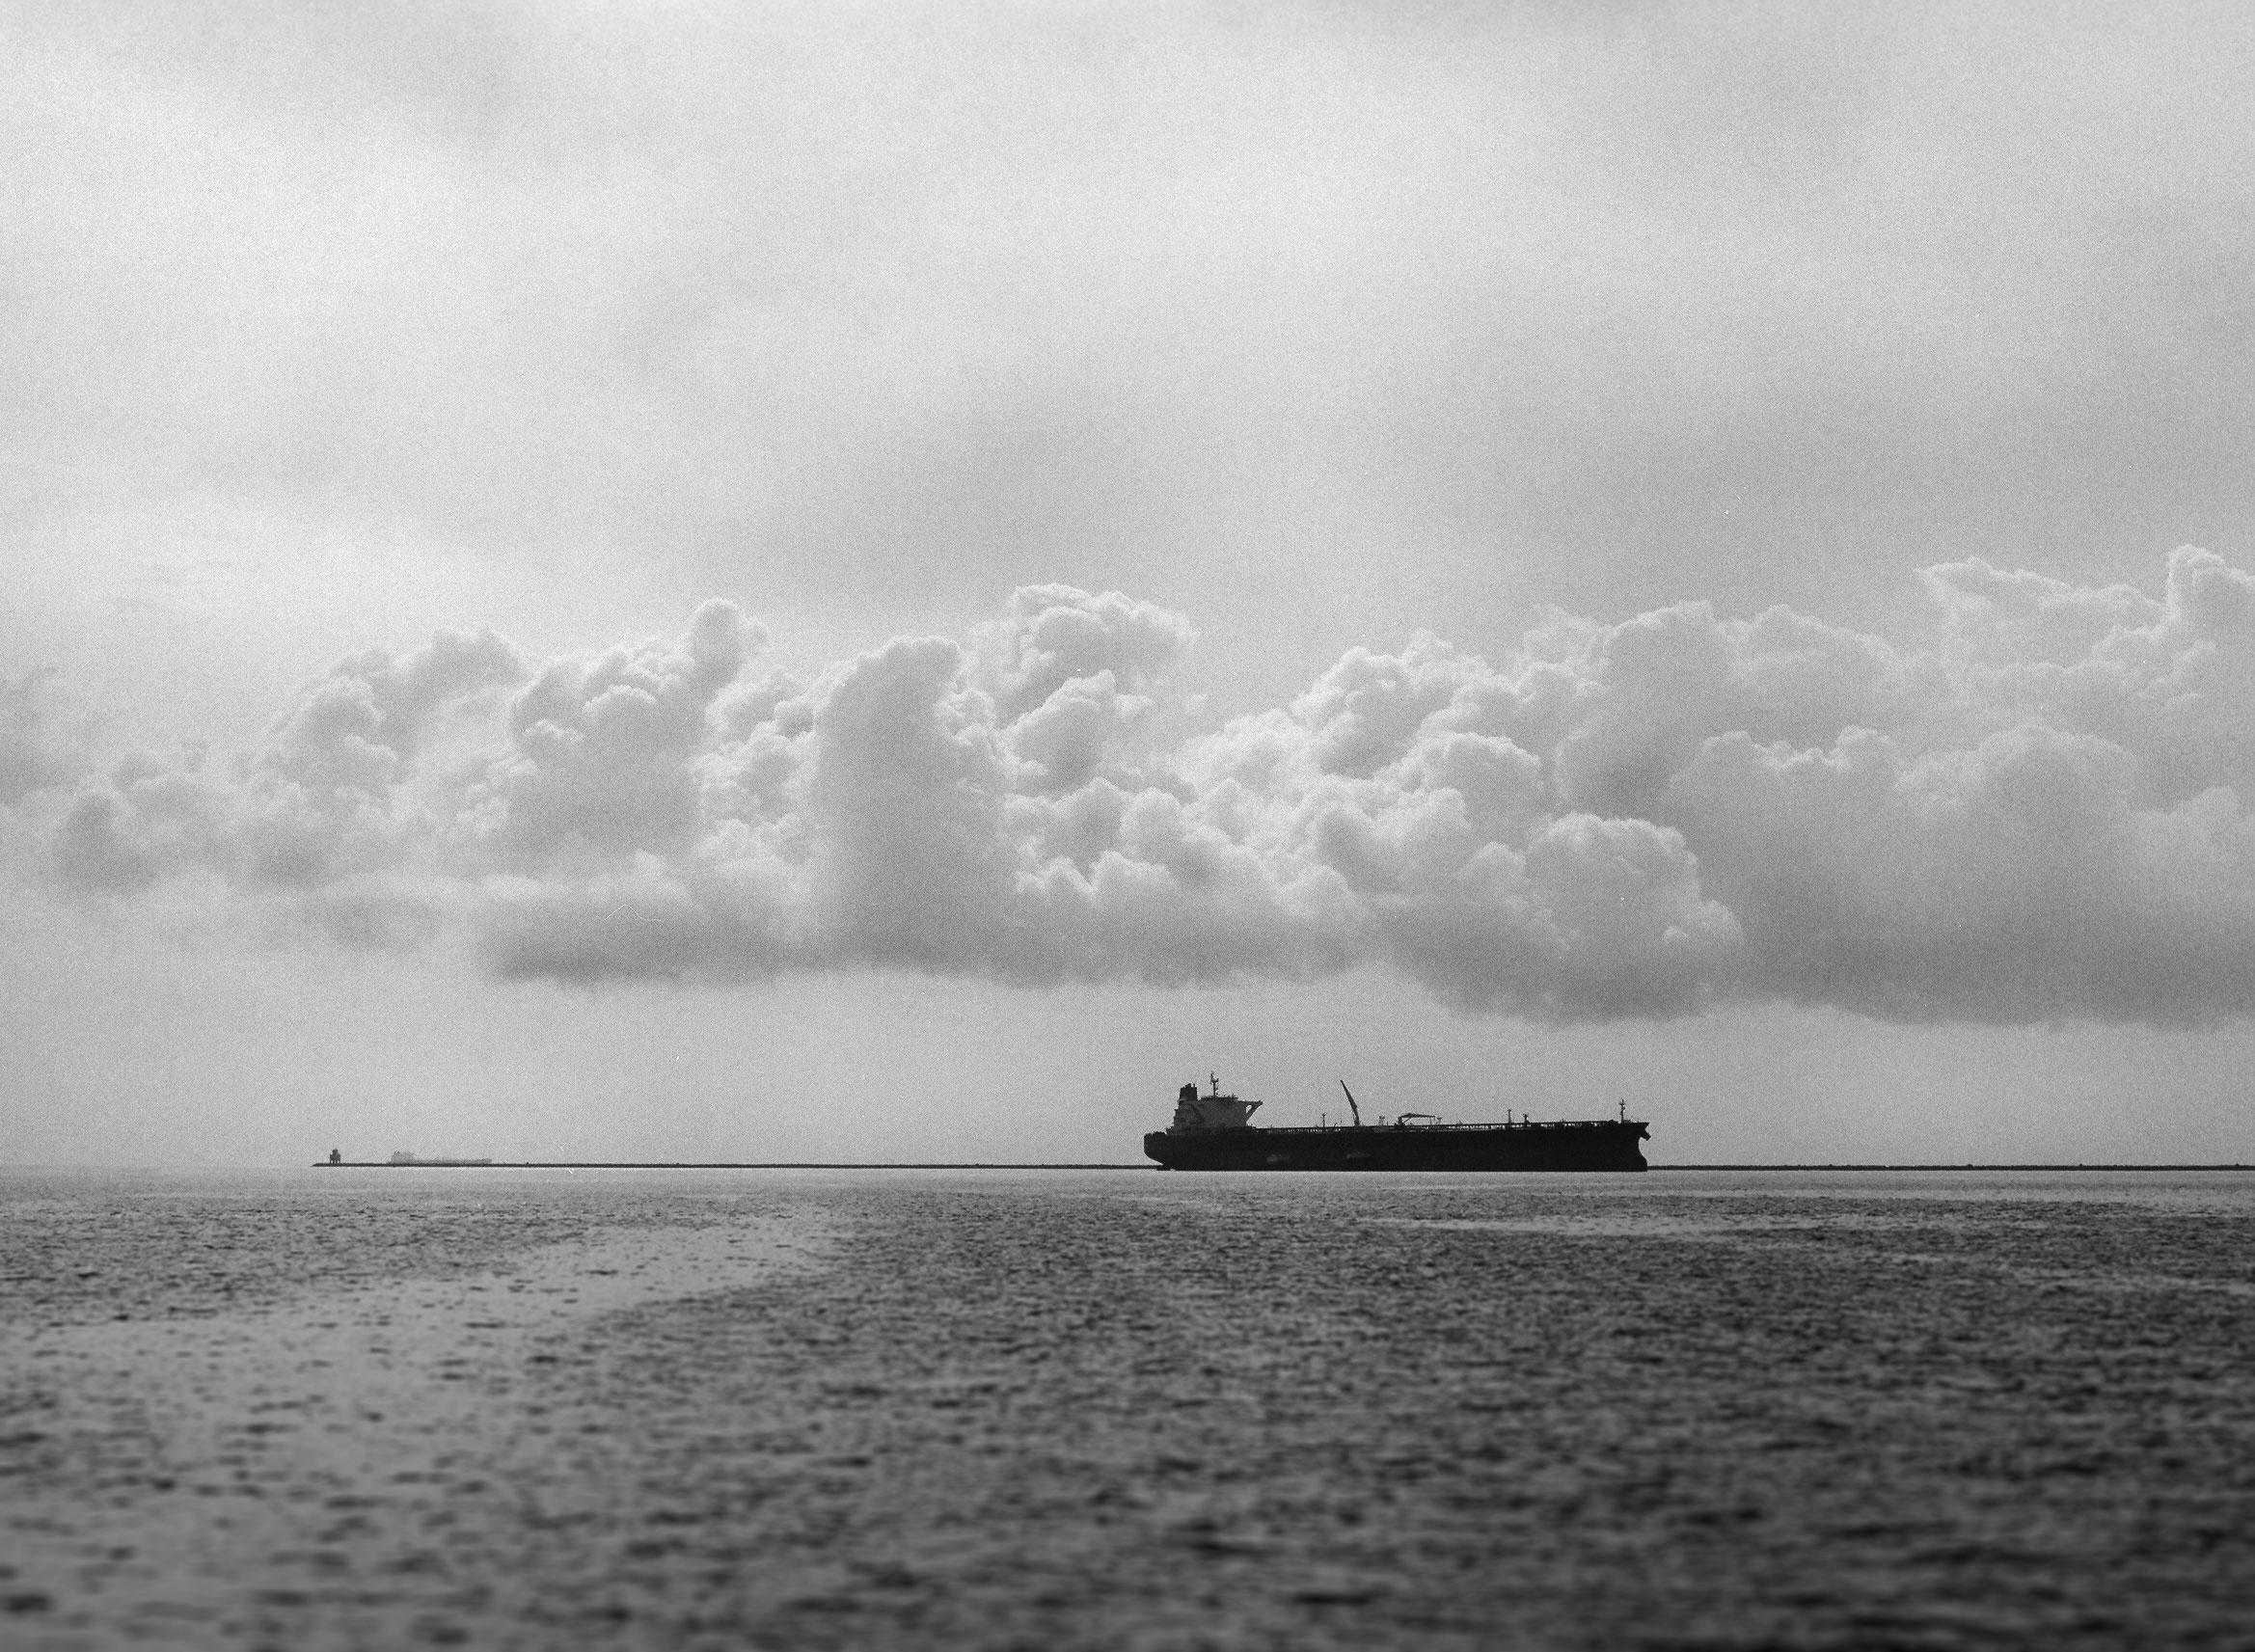 port-of-long-beach-bridge-black-and-white-film-photography-mamiya-02